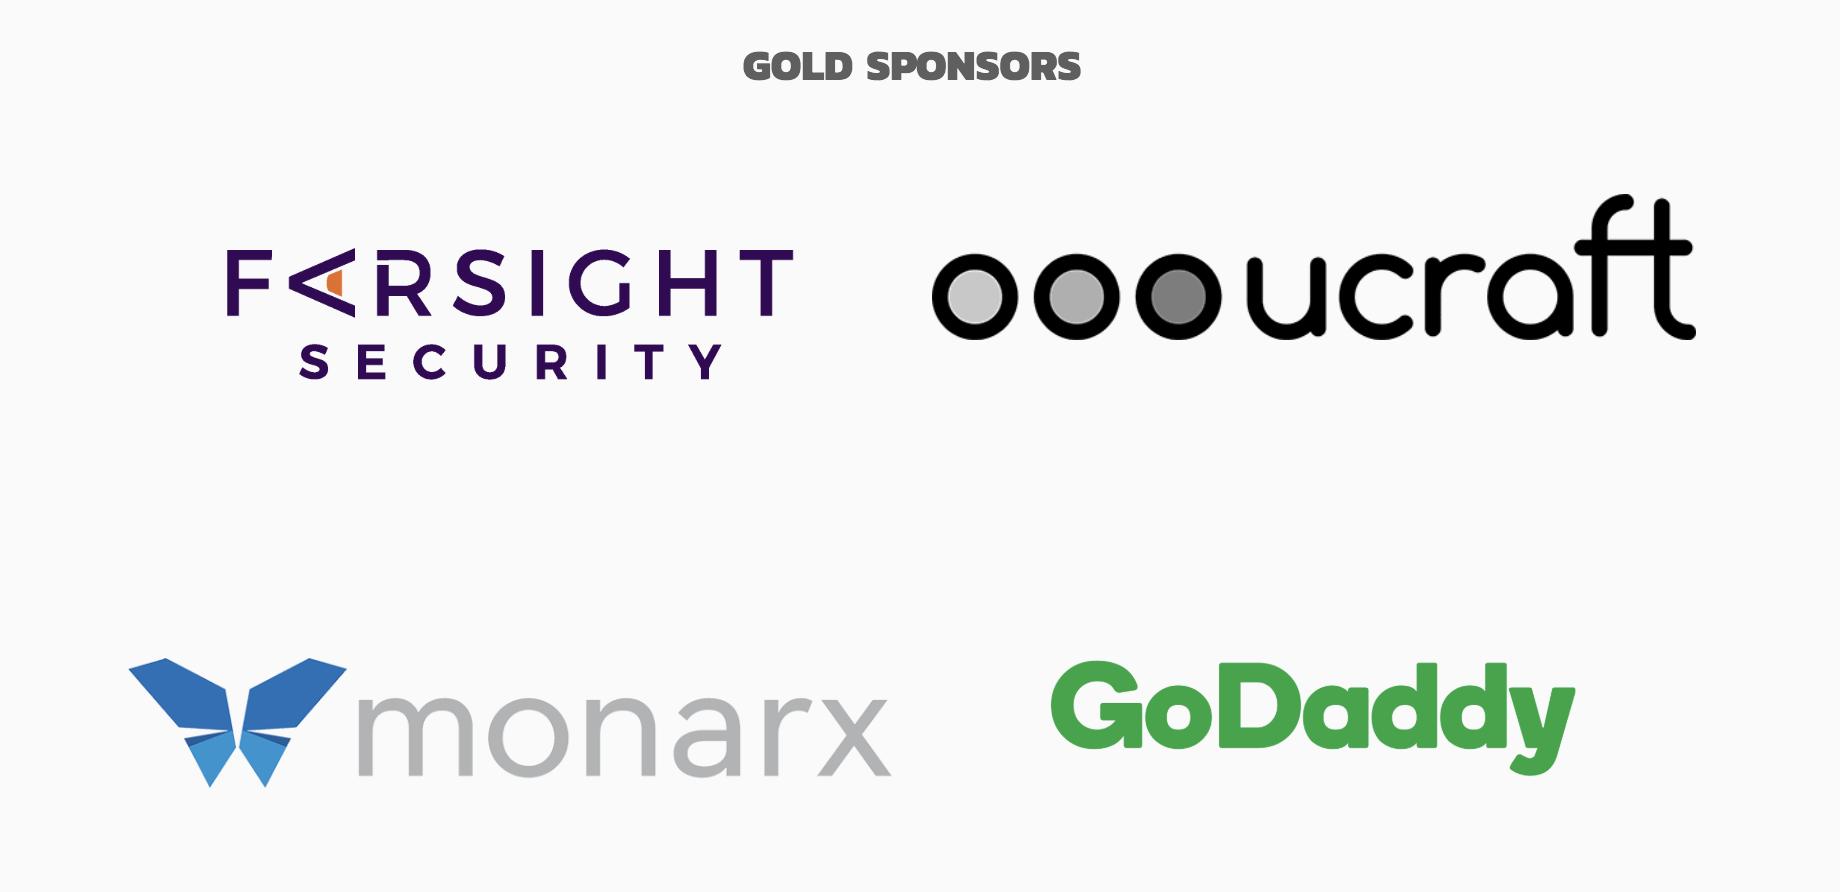 CMSSUMMIT Gold Sponsors